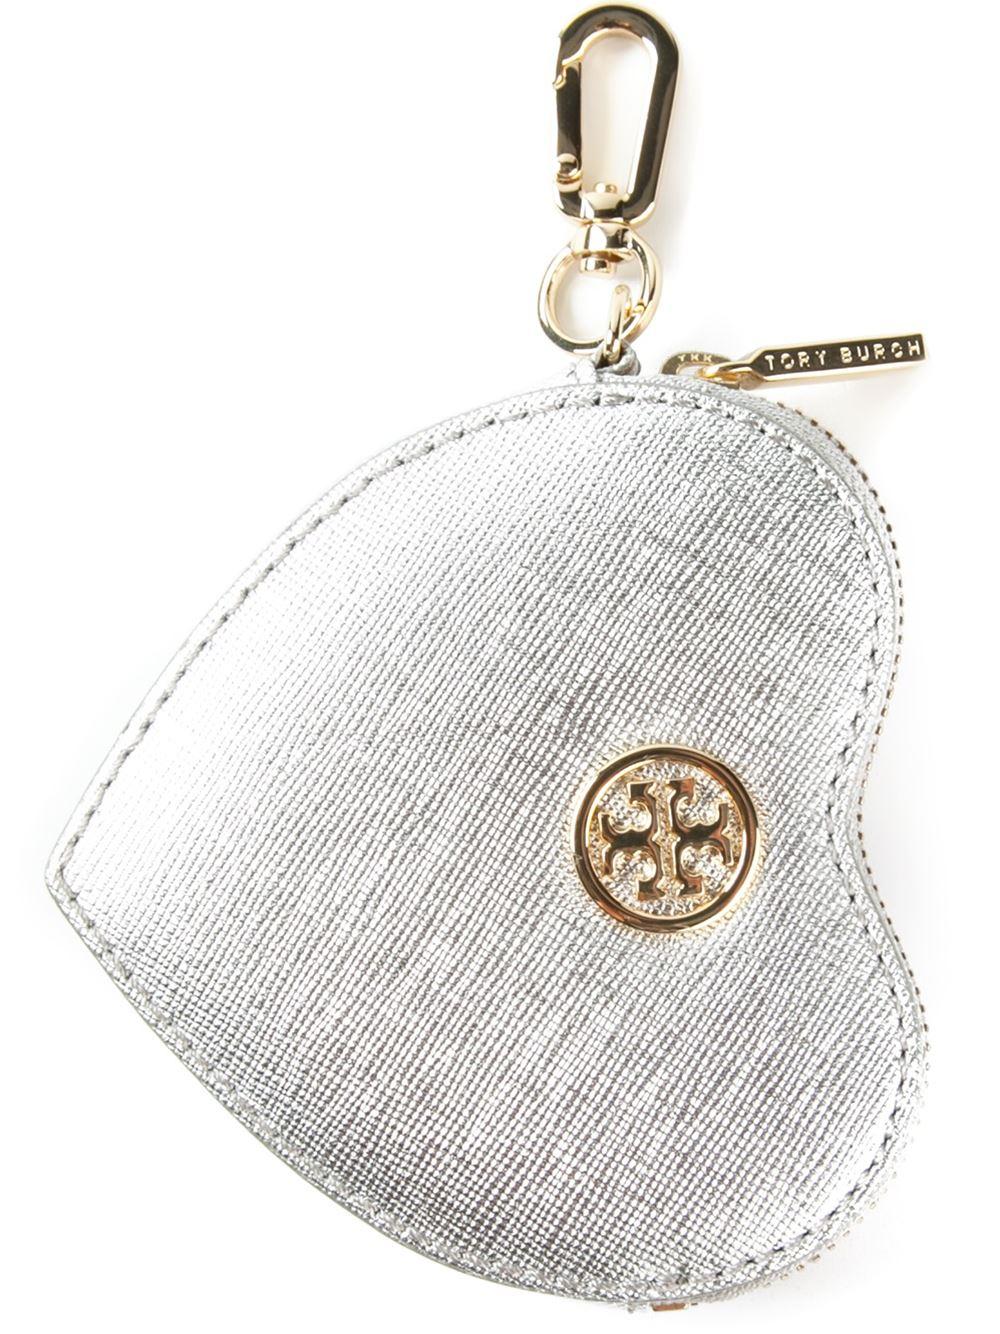 5415baf4e13d Lyst - Tory Burch Heart Coin Case Key Fob in Metallic